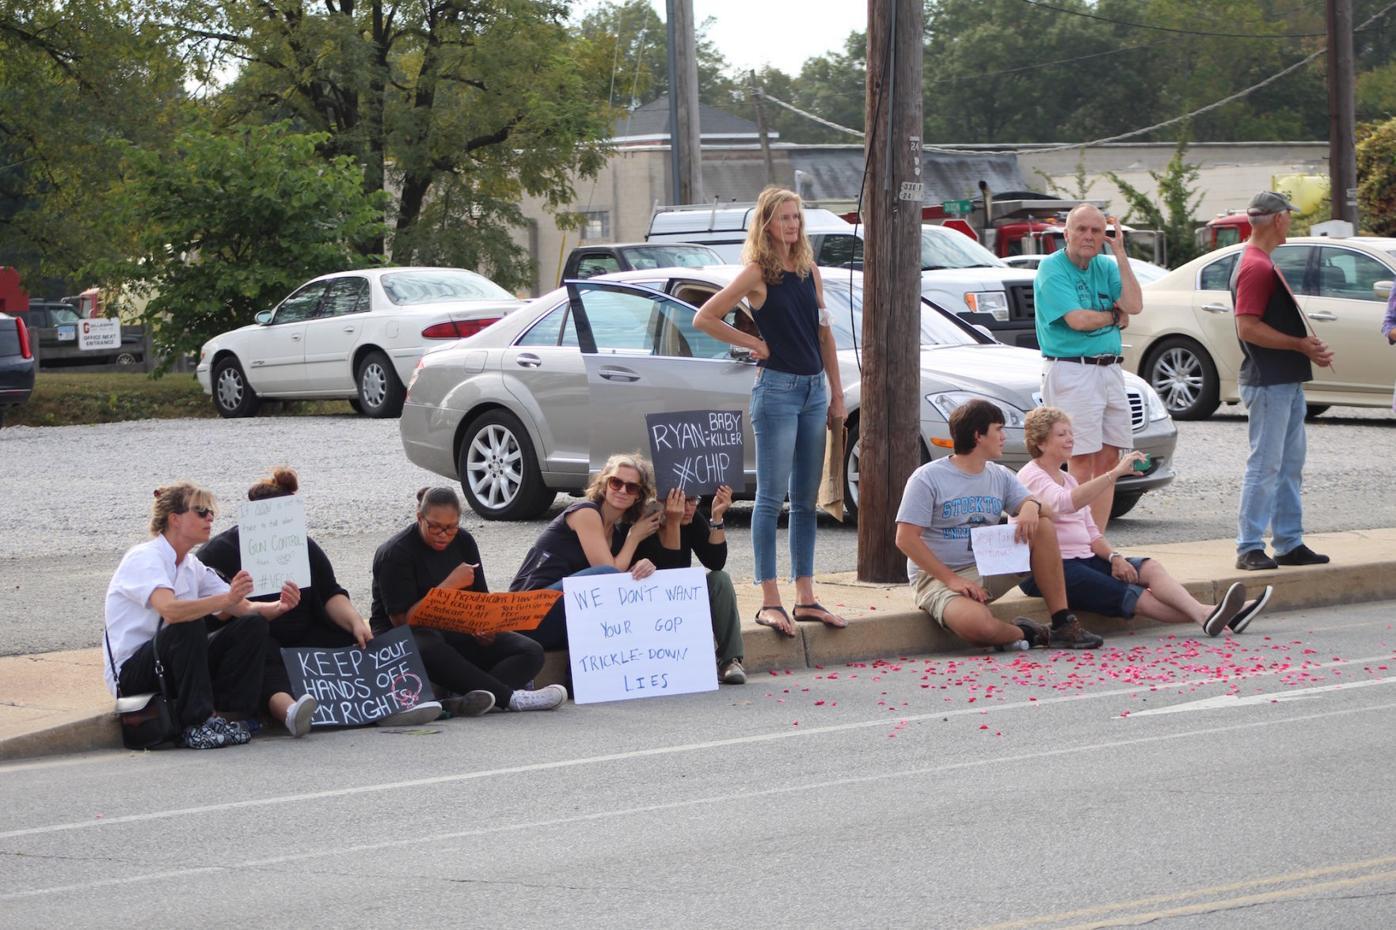 Protesting House Speaker Paul Ryan's visit to Dixon Valve & Coupling